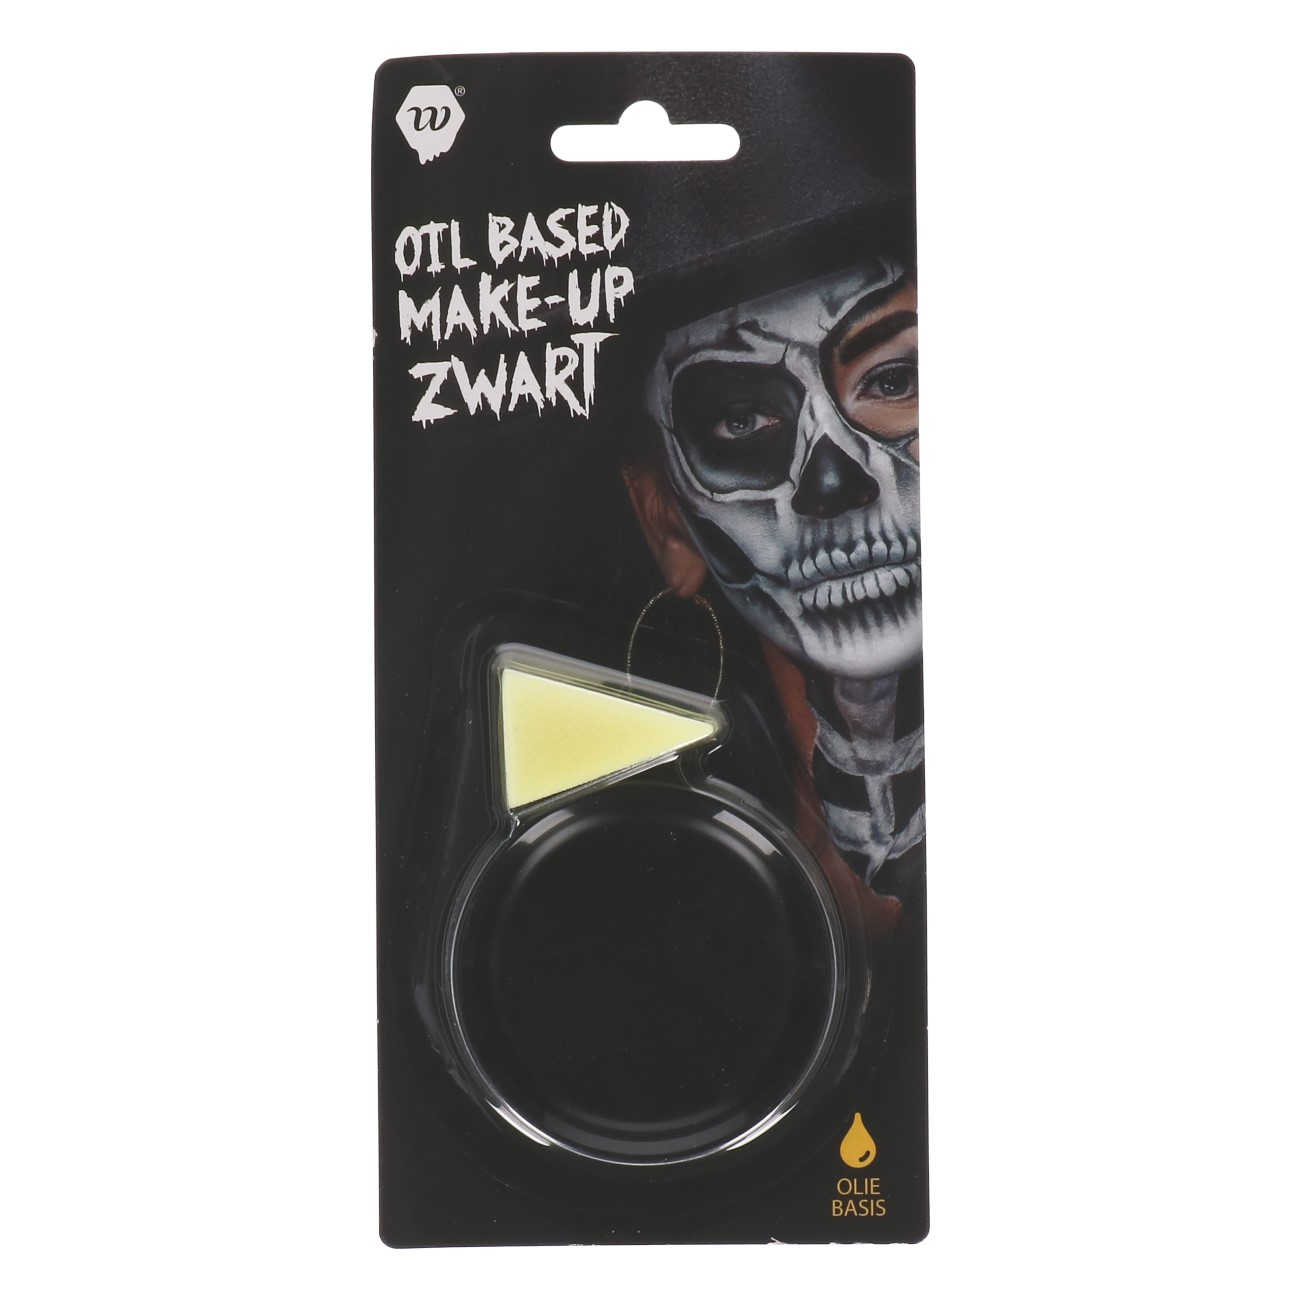 Oil-Based Make-up Zwart Wauwfactor